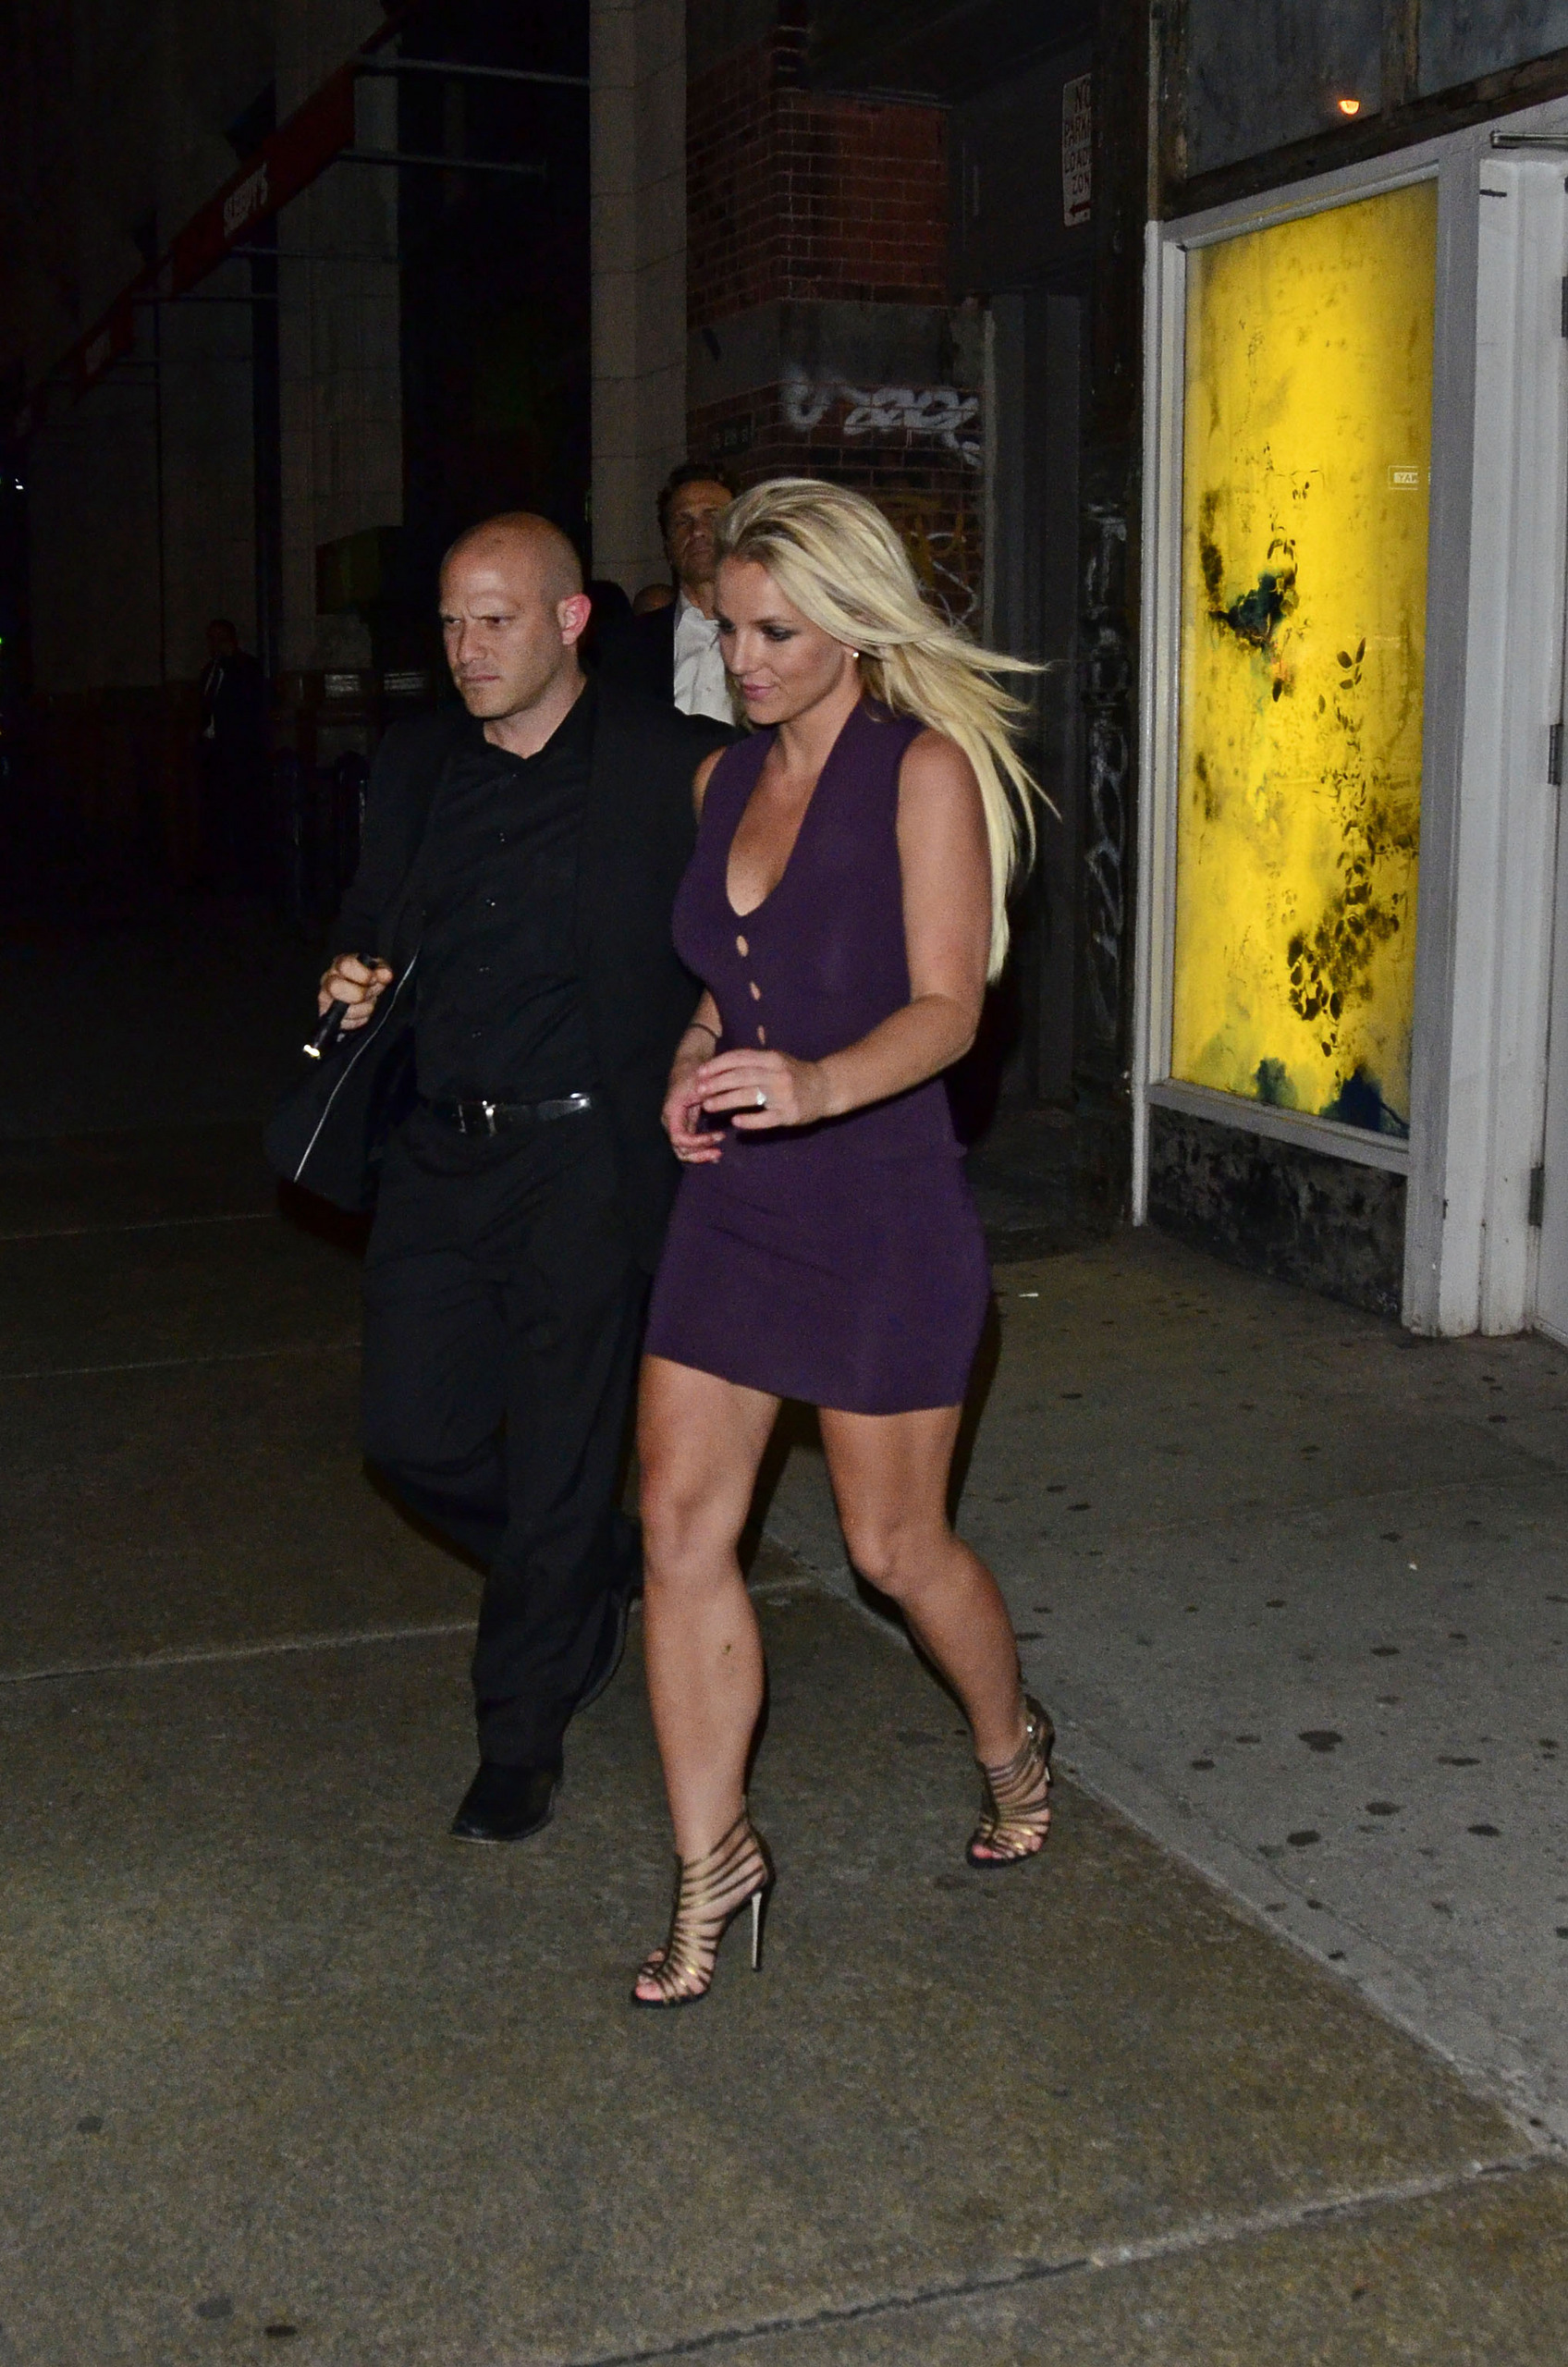 ABC Kitchen Restaurant In New York City [14 May 2012]